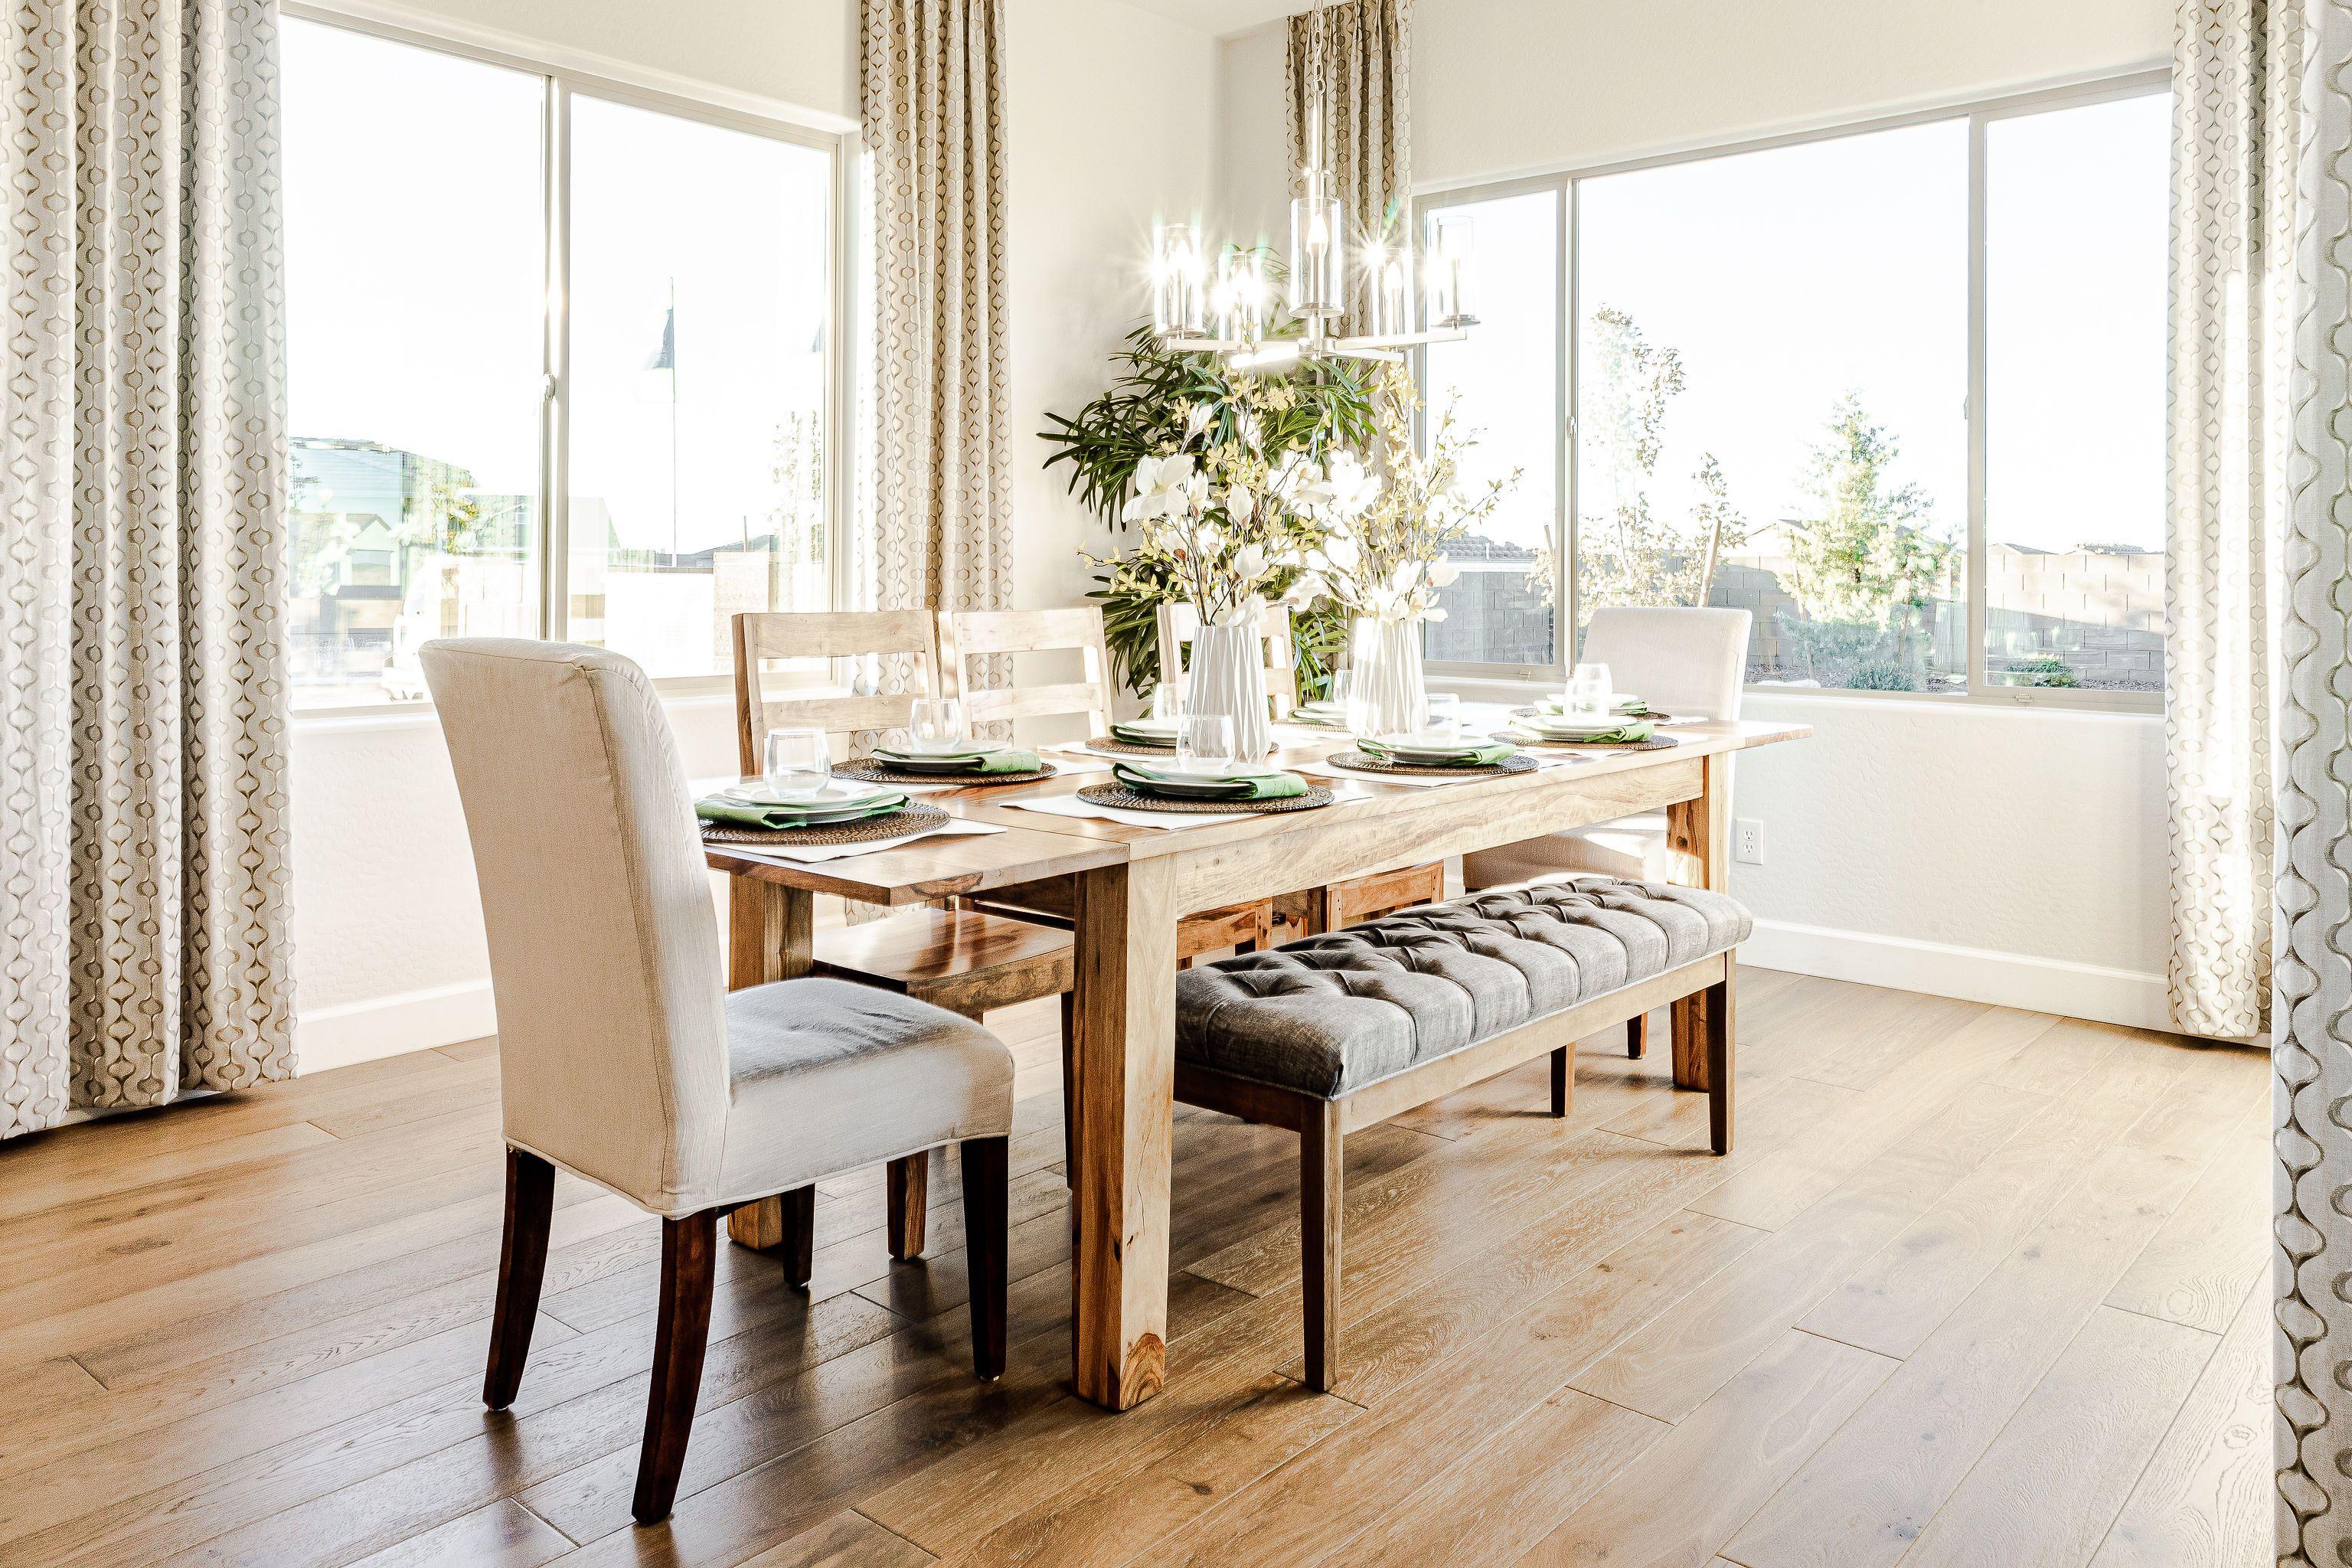 Kitchen featured in the Keystone By Dorn Homes  in Prescott, AZ